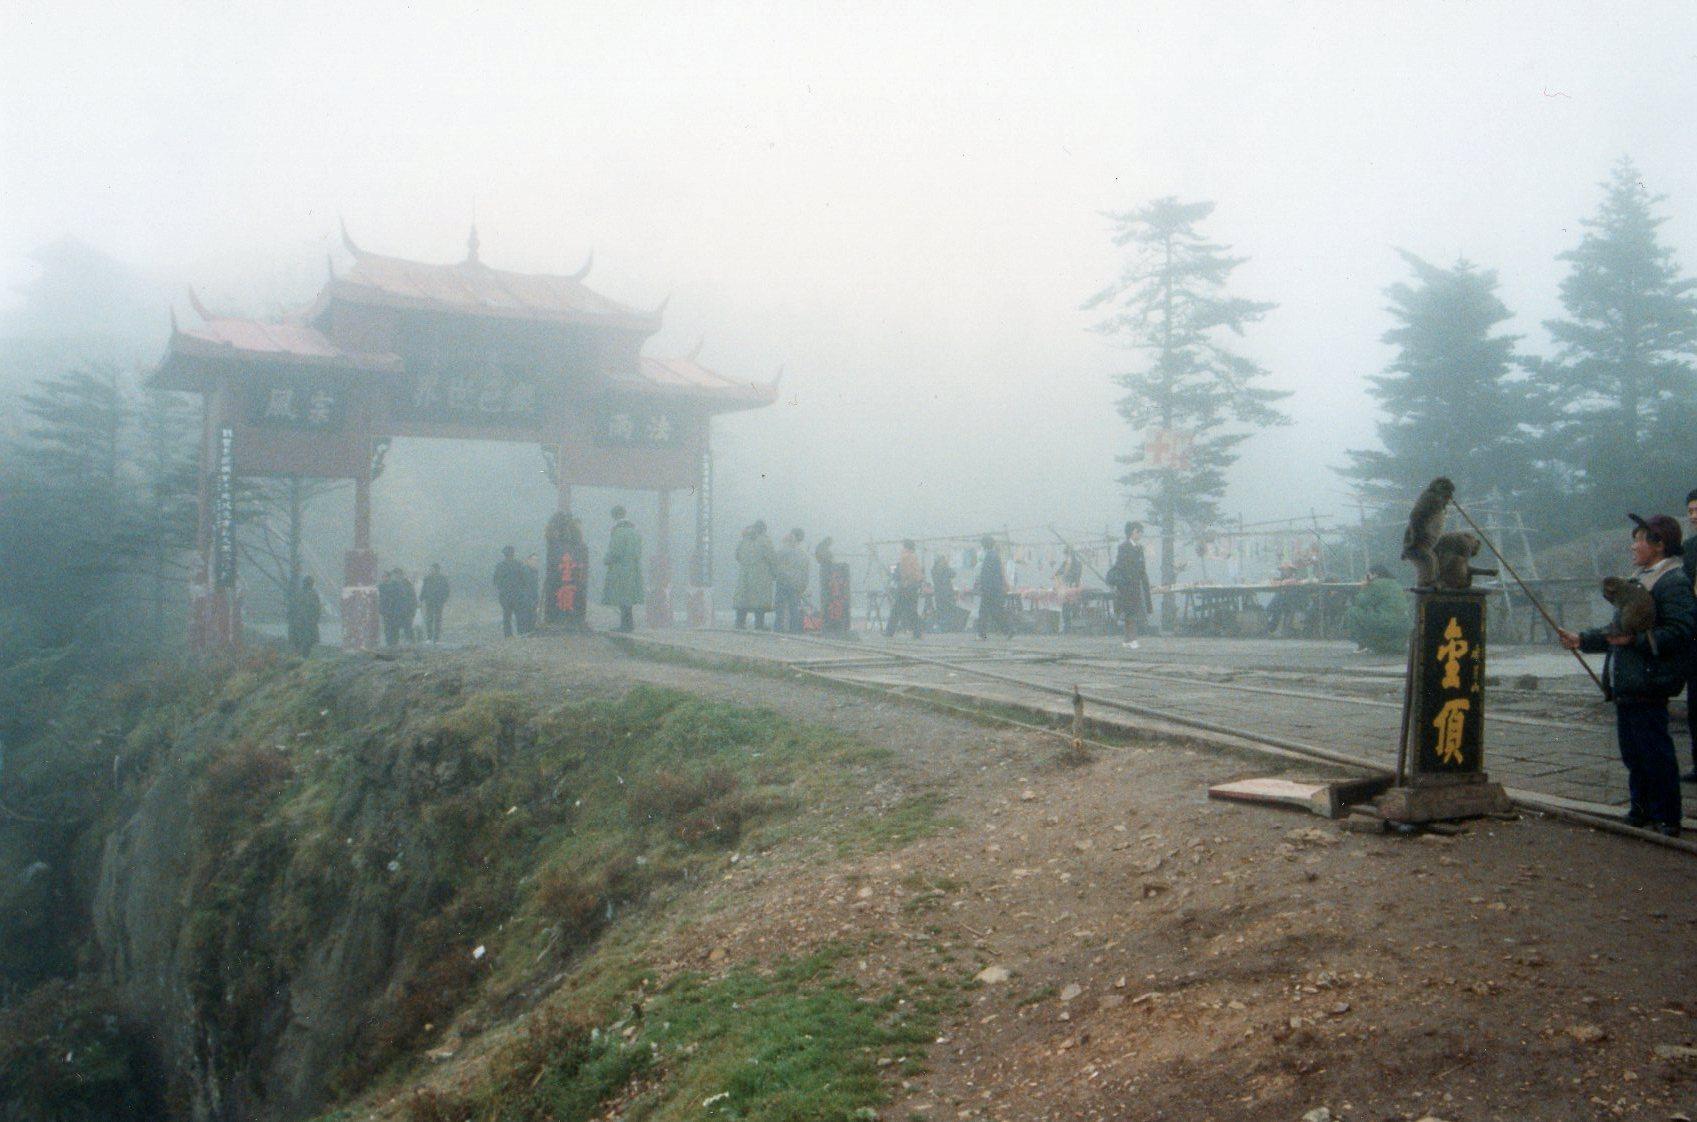 China Sichuan, Emei Shan, The summit area, in cloud, monkeys, Walkopedia